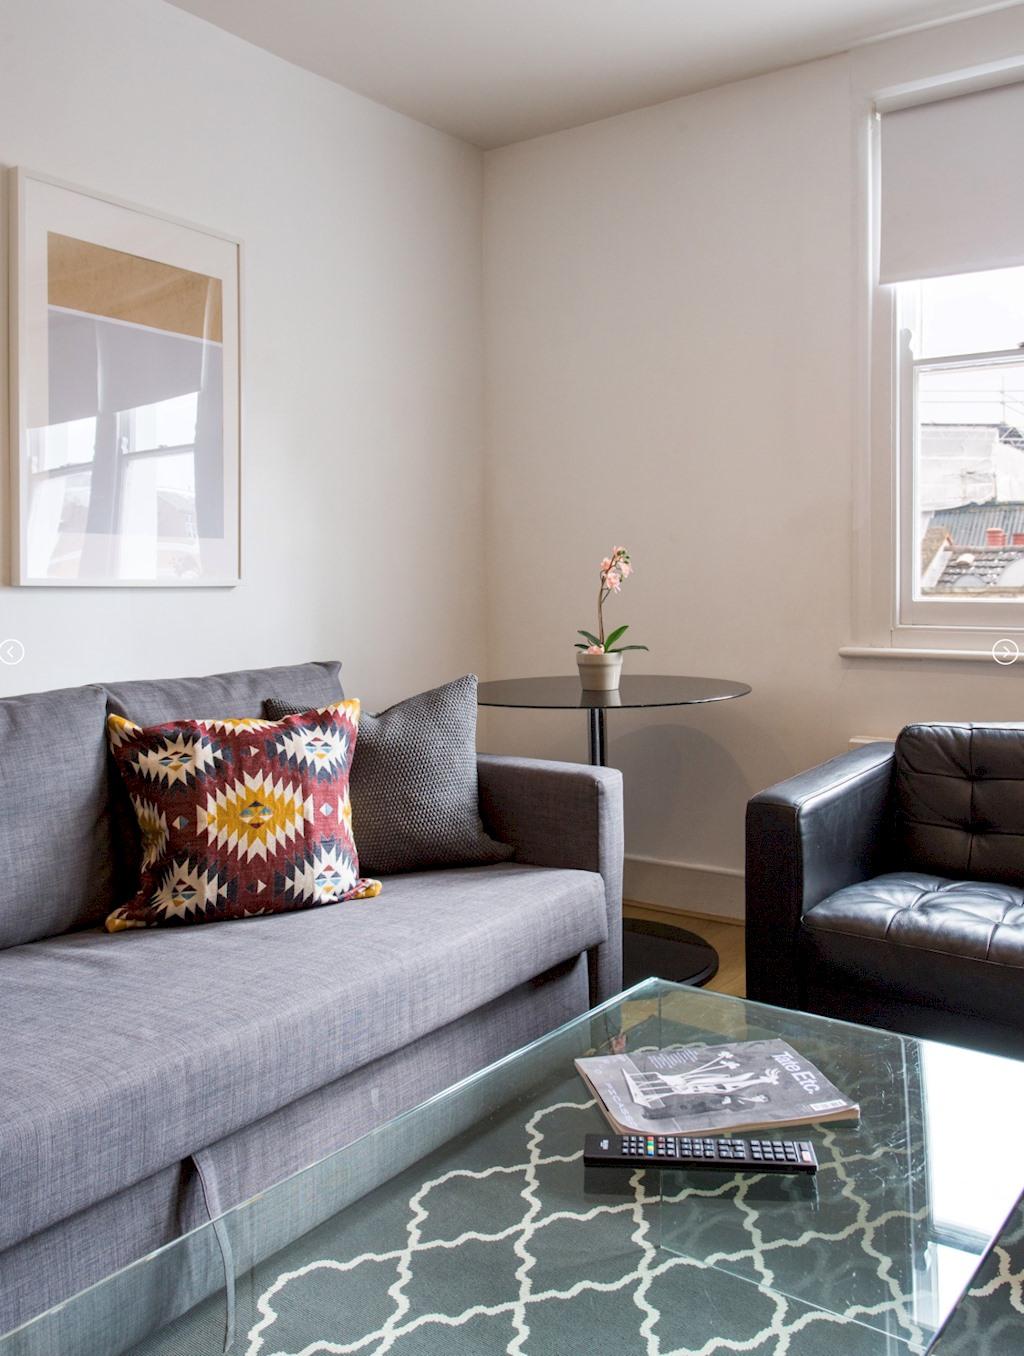 2 Bedroom Apartment near Edgware Road F6 BS (RU/CL) photo 16089029